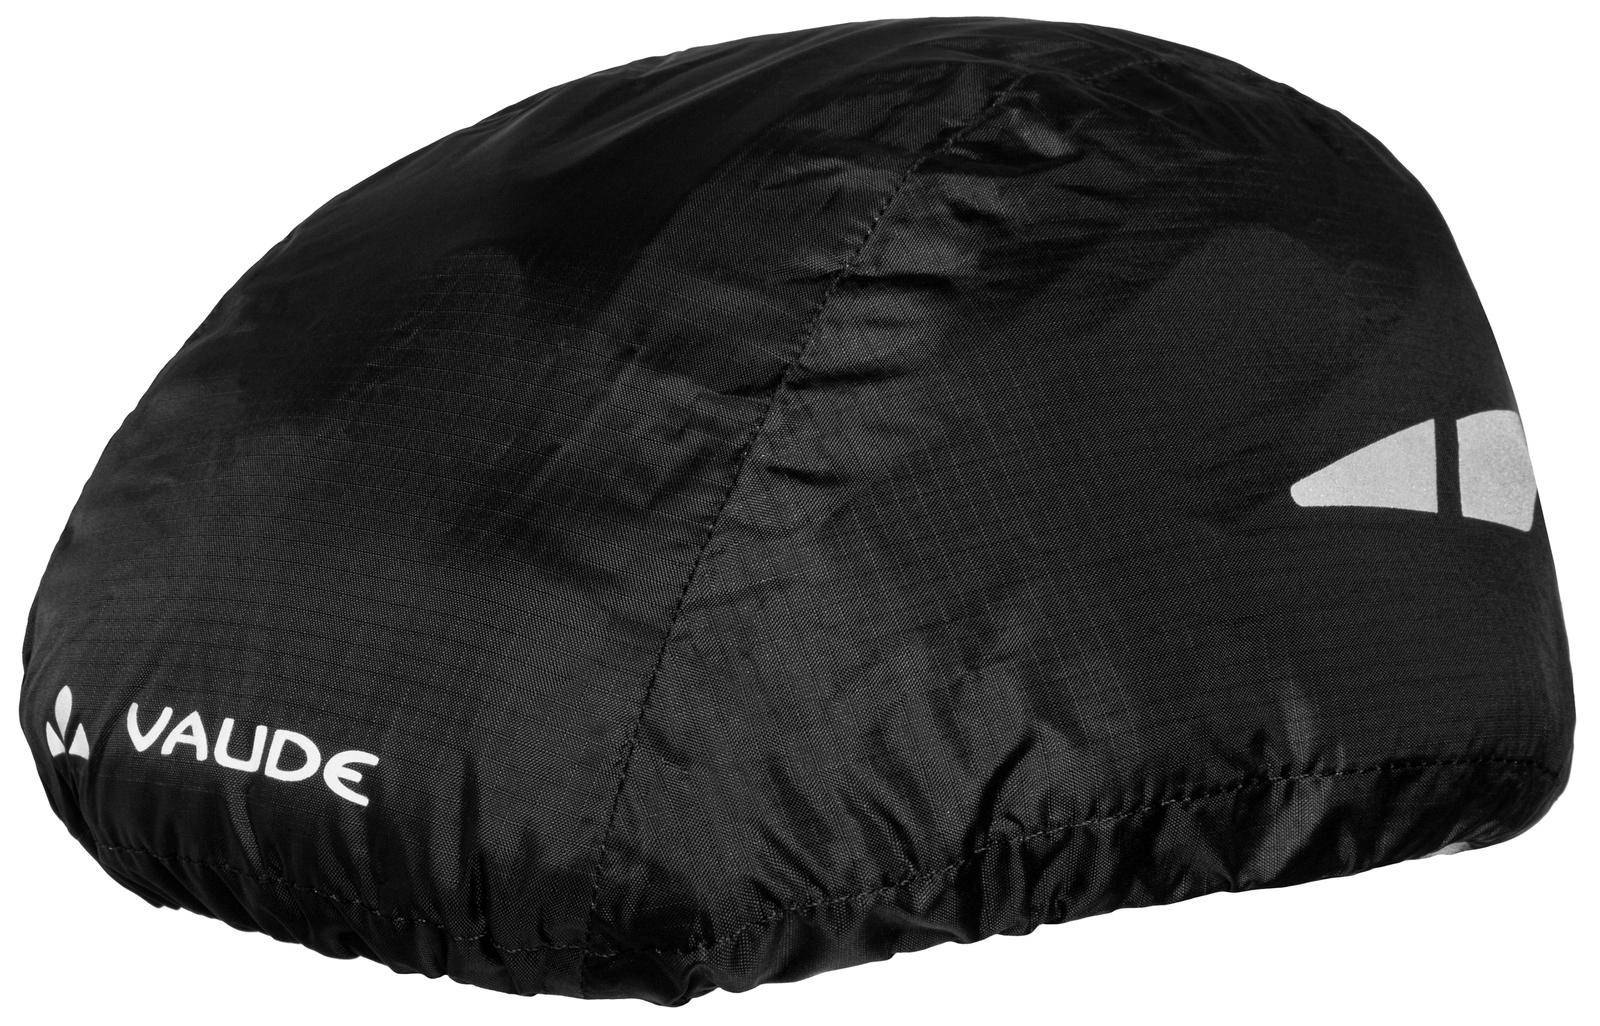 VAUDE Helmet Raincover black  - Total Normal Bikes - Onlineshop und E-Bike Fahrradgeschäft in St.Ingbert im Saarland